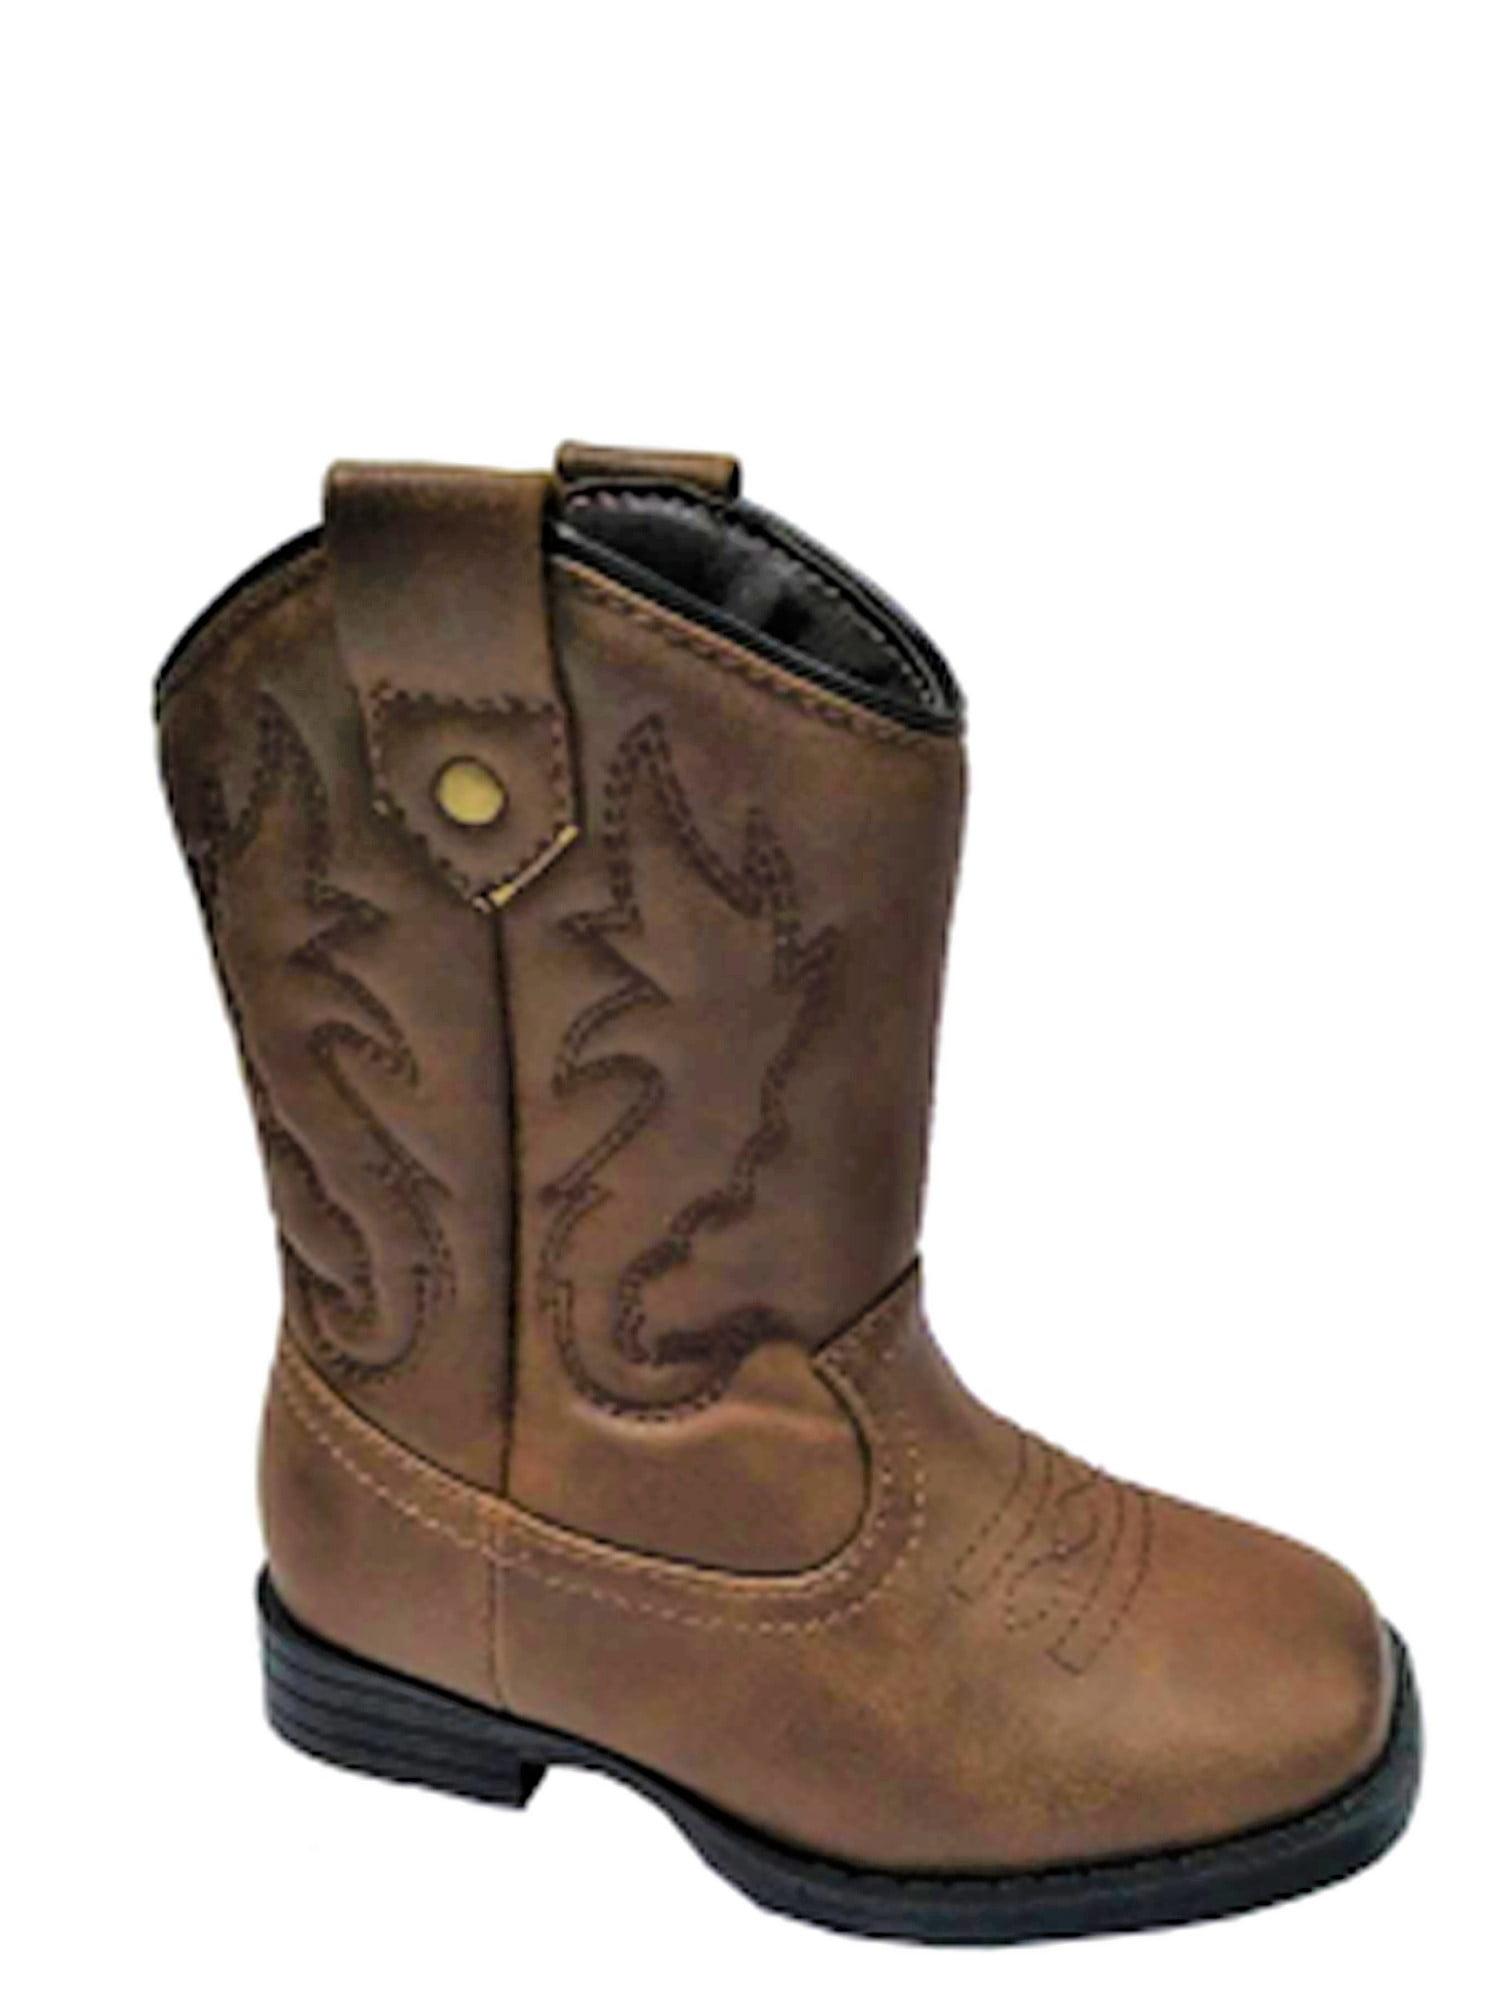 ff5fb5916 Wonder Nation - Wonder Nation Toddler Boys' Cowboy Boot - Walmart.com